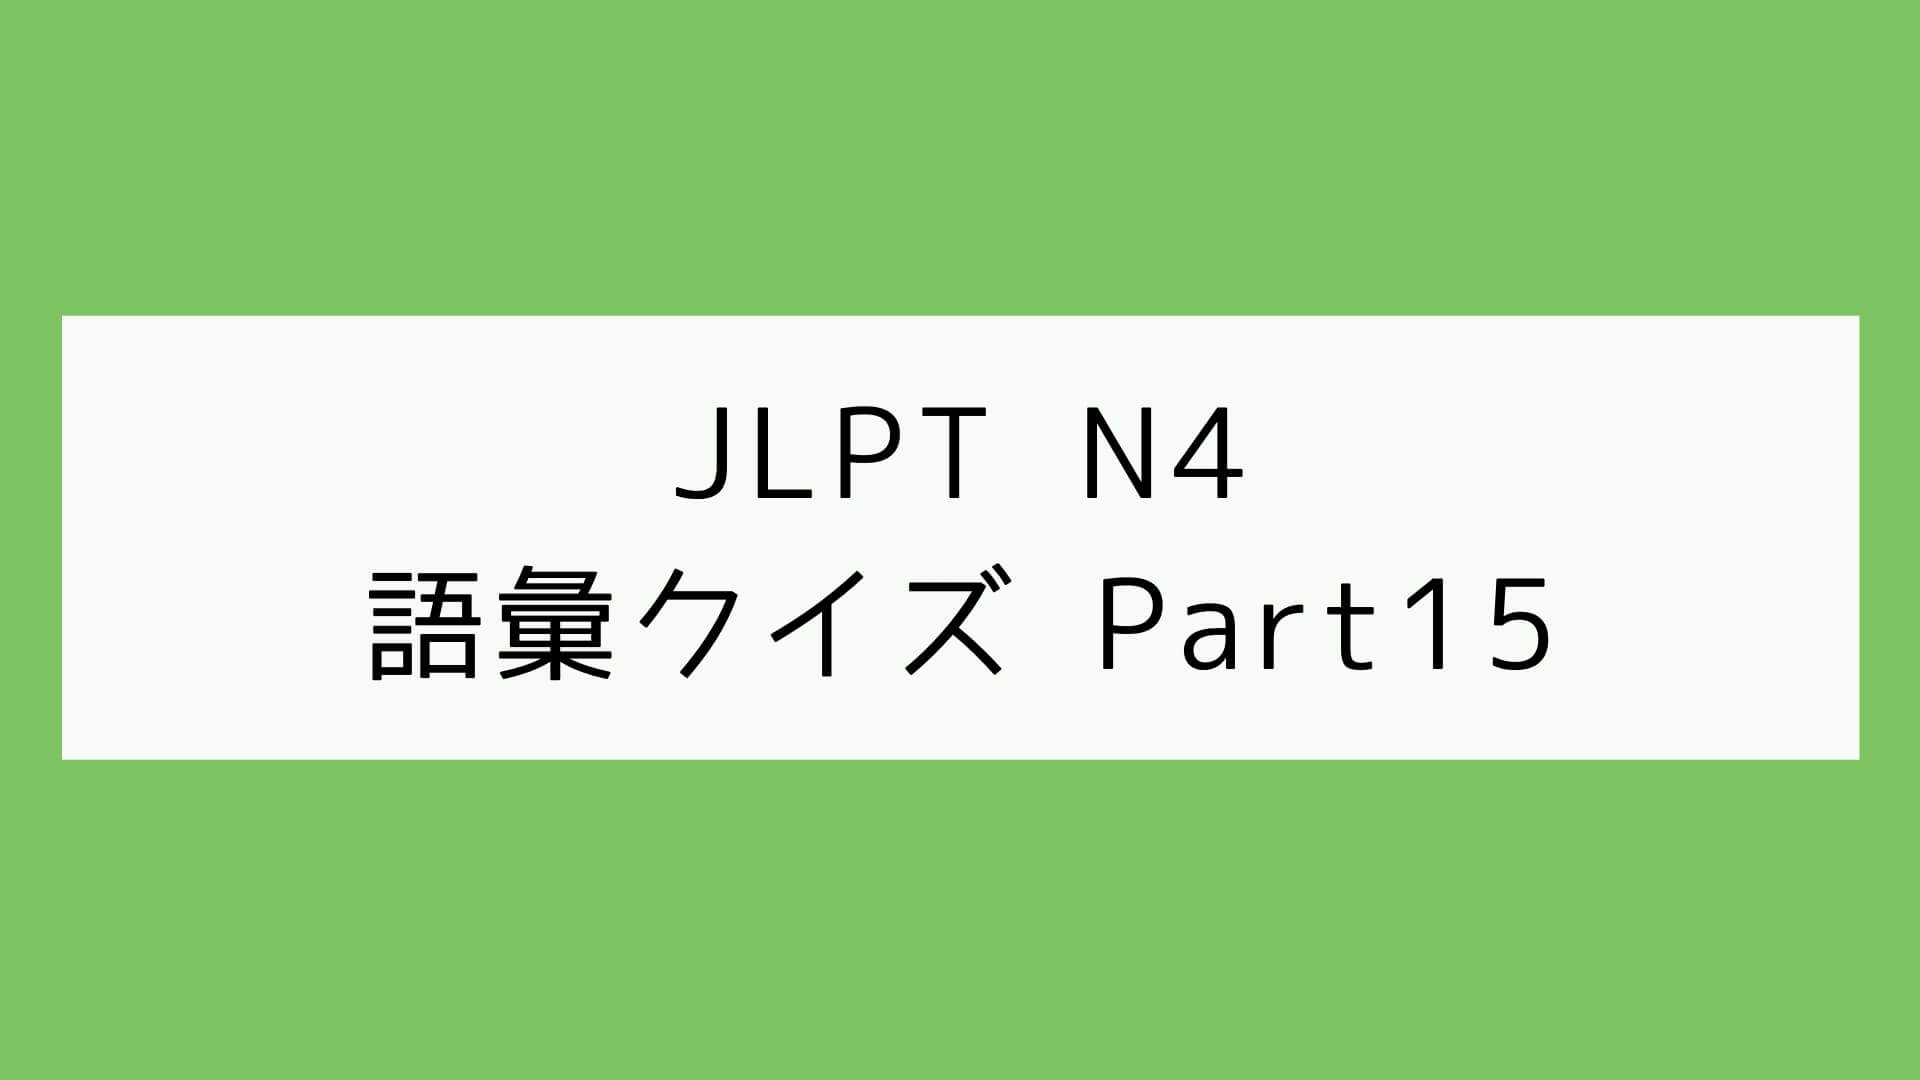 【JLPT N4】語彙クイズ Part15